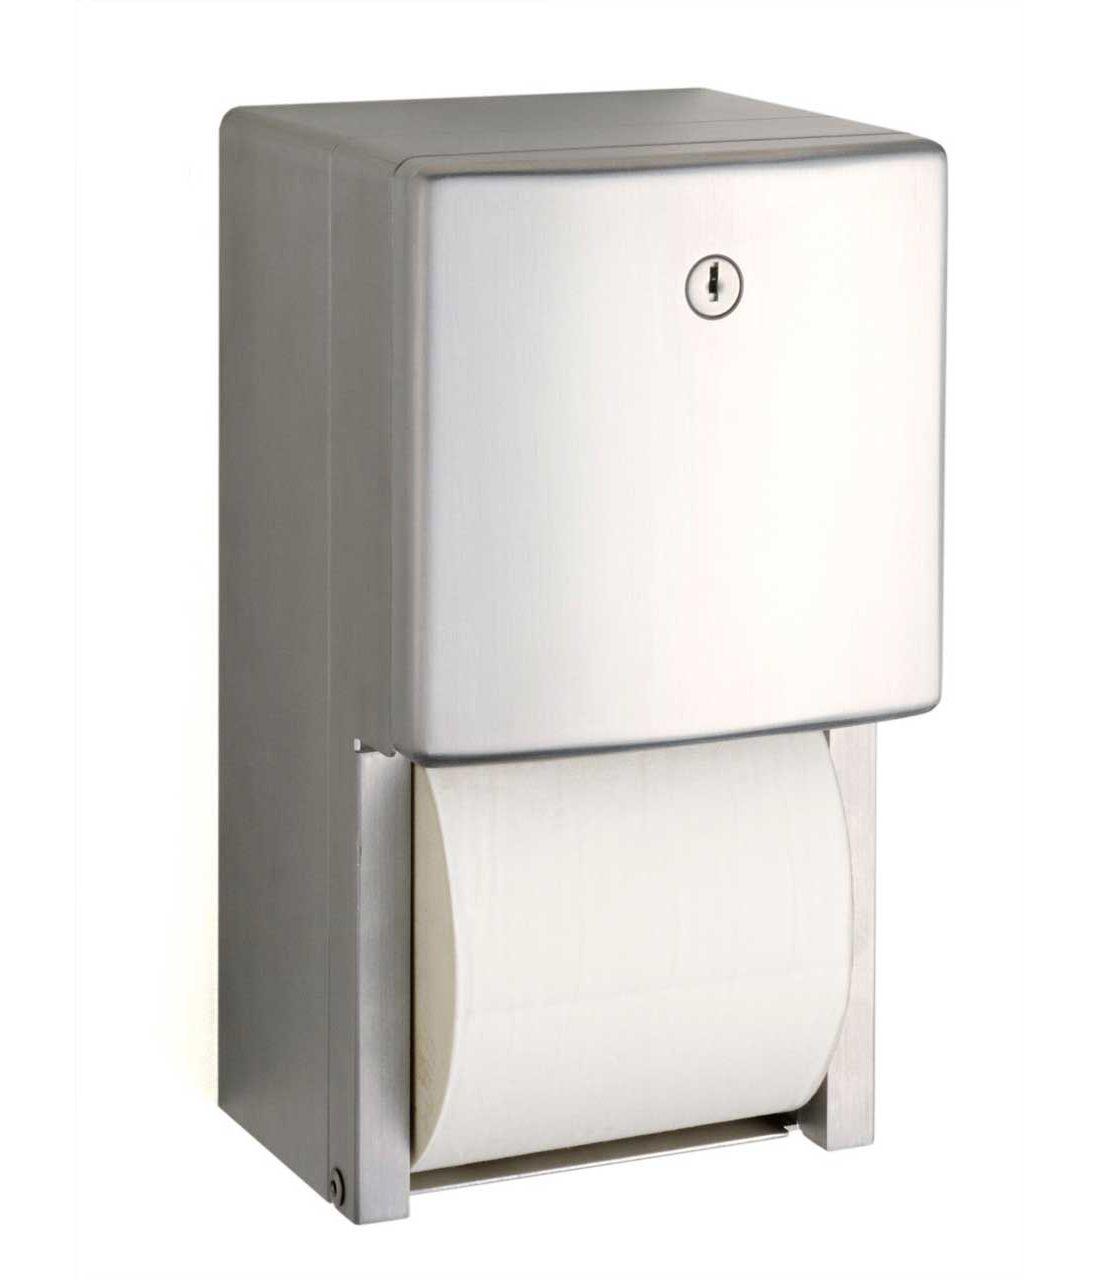 Ada Bathroom Paper Towel Dispenser Height toilet paper dispenser for all stalls in men's and women's